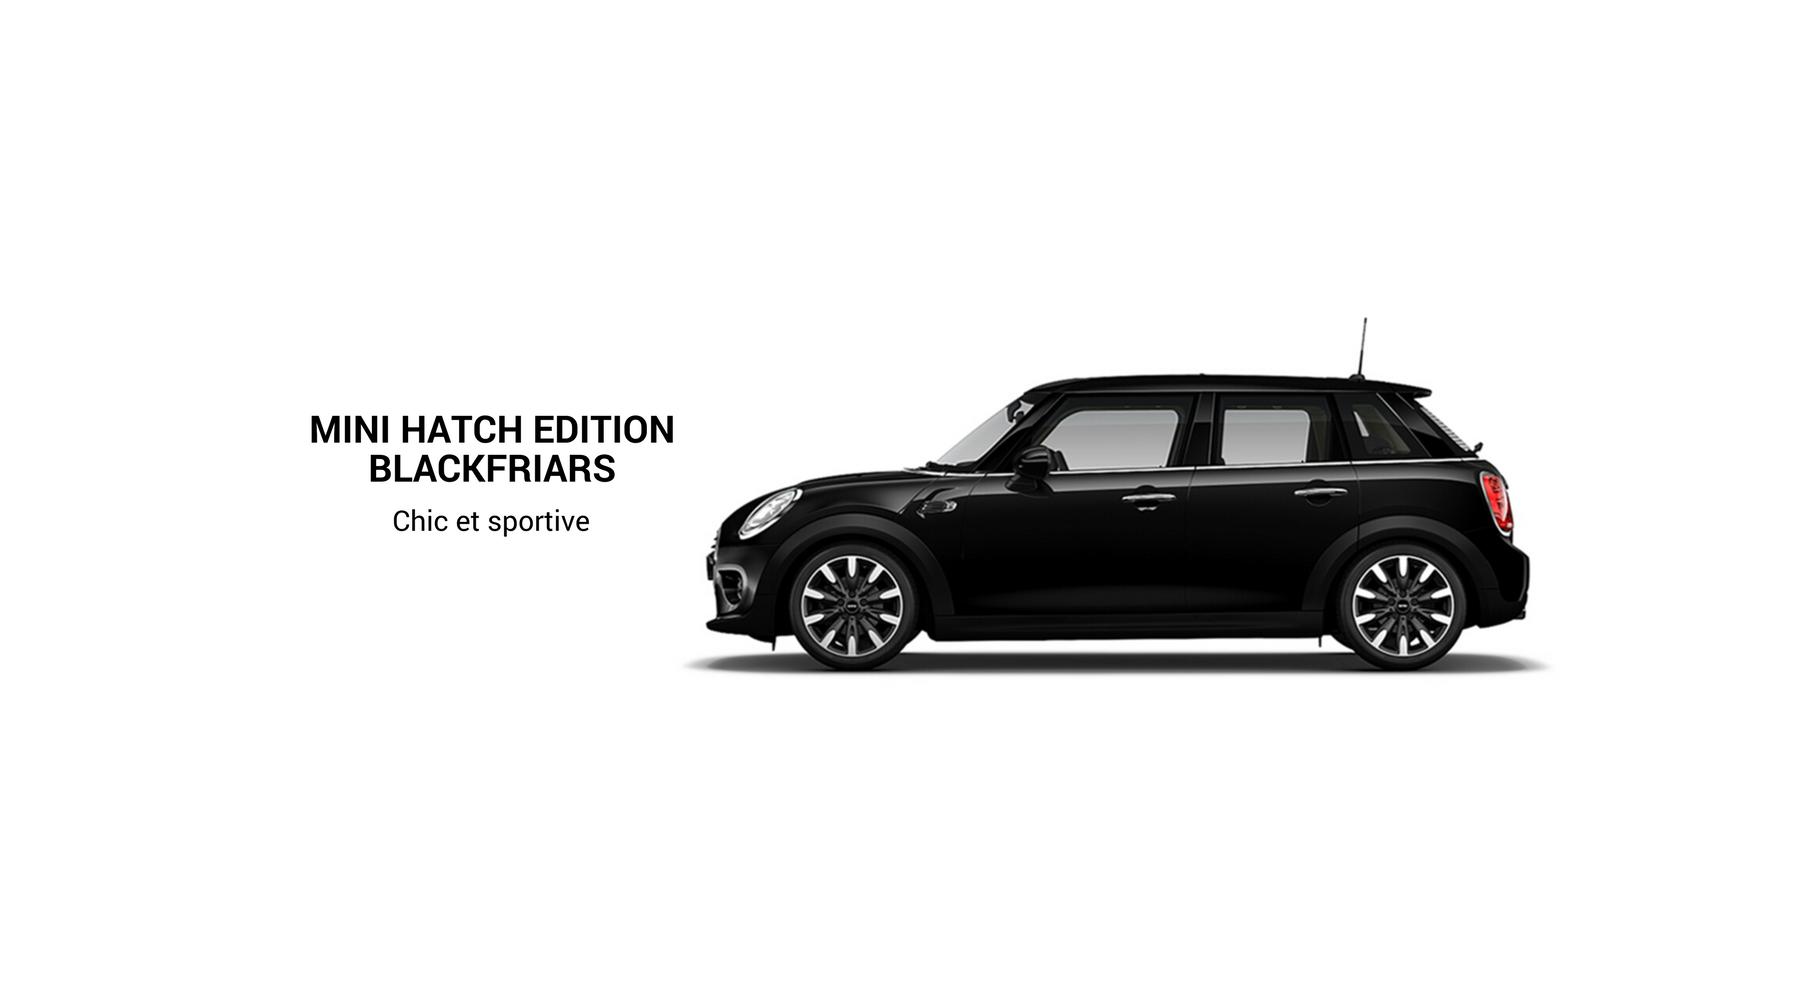 mini hatch edition blackfriars (1).png